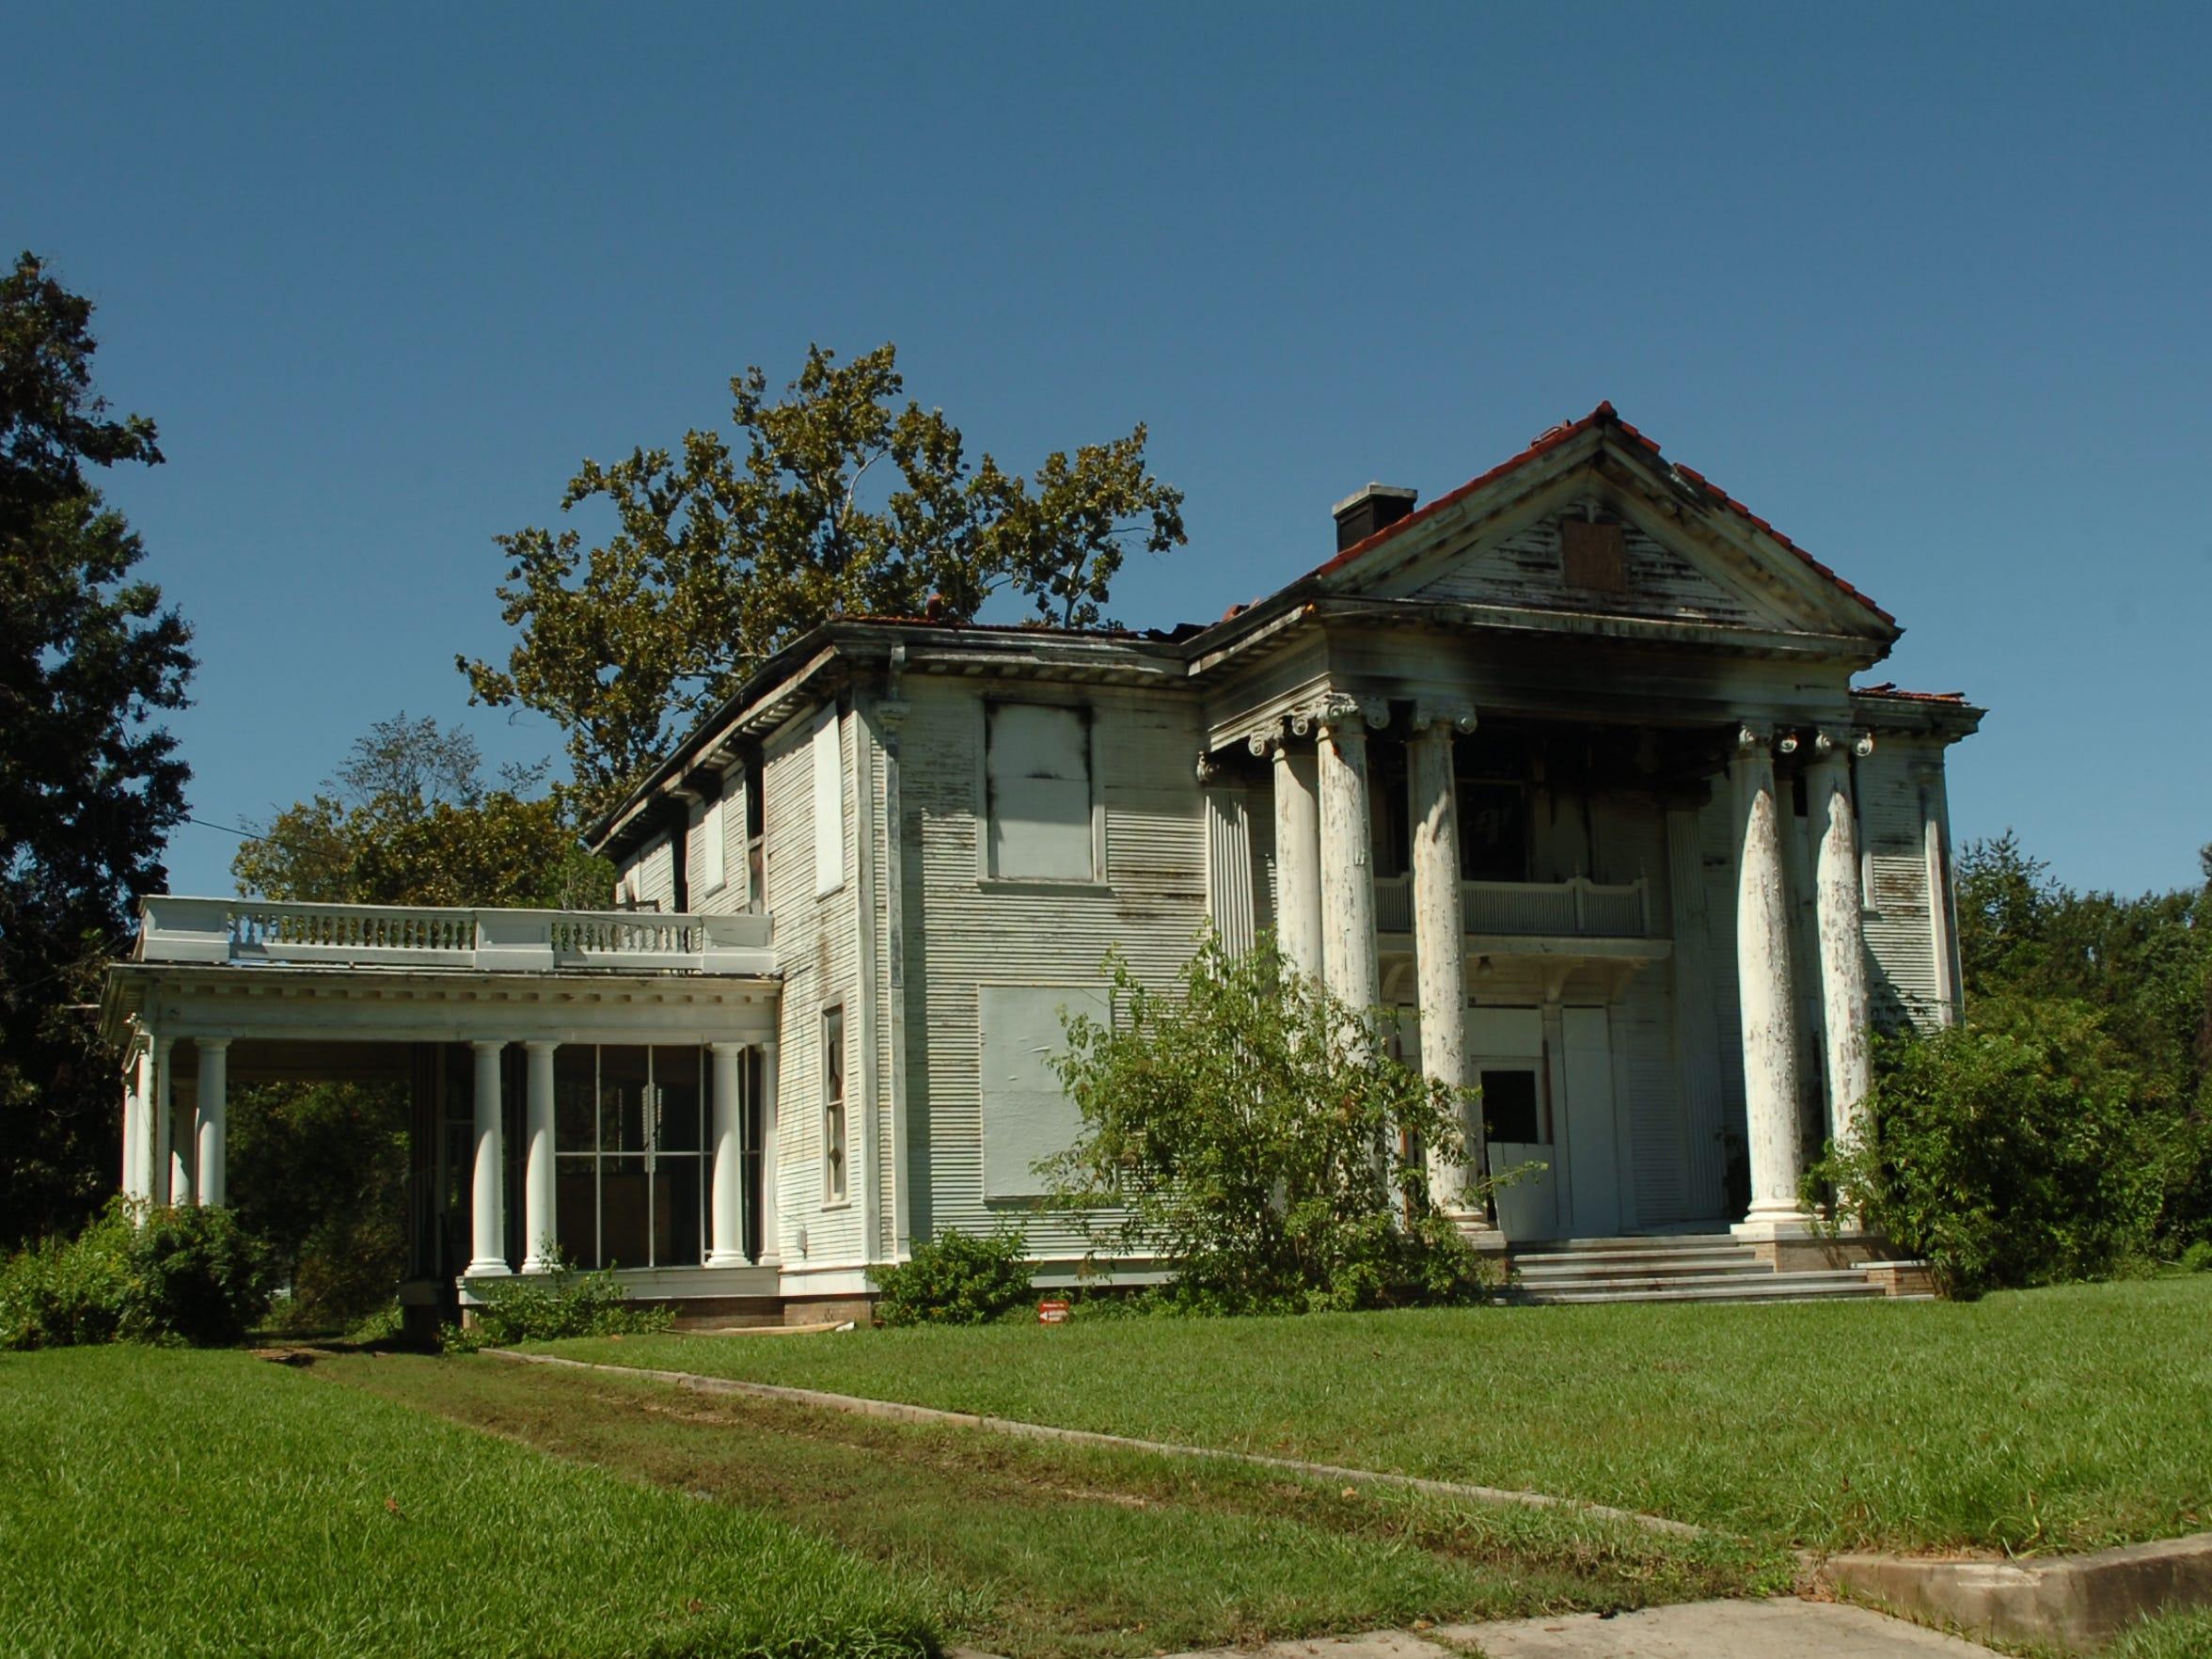 The Thompson-Hargis home on Florence Avenue was demolished